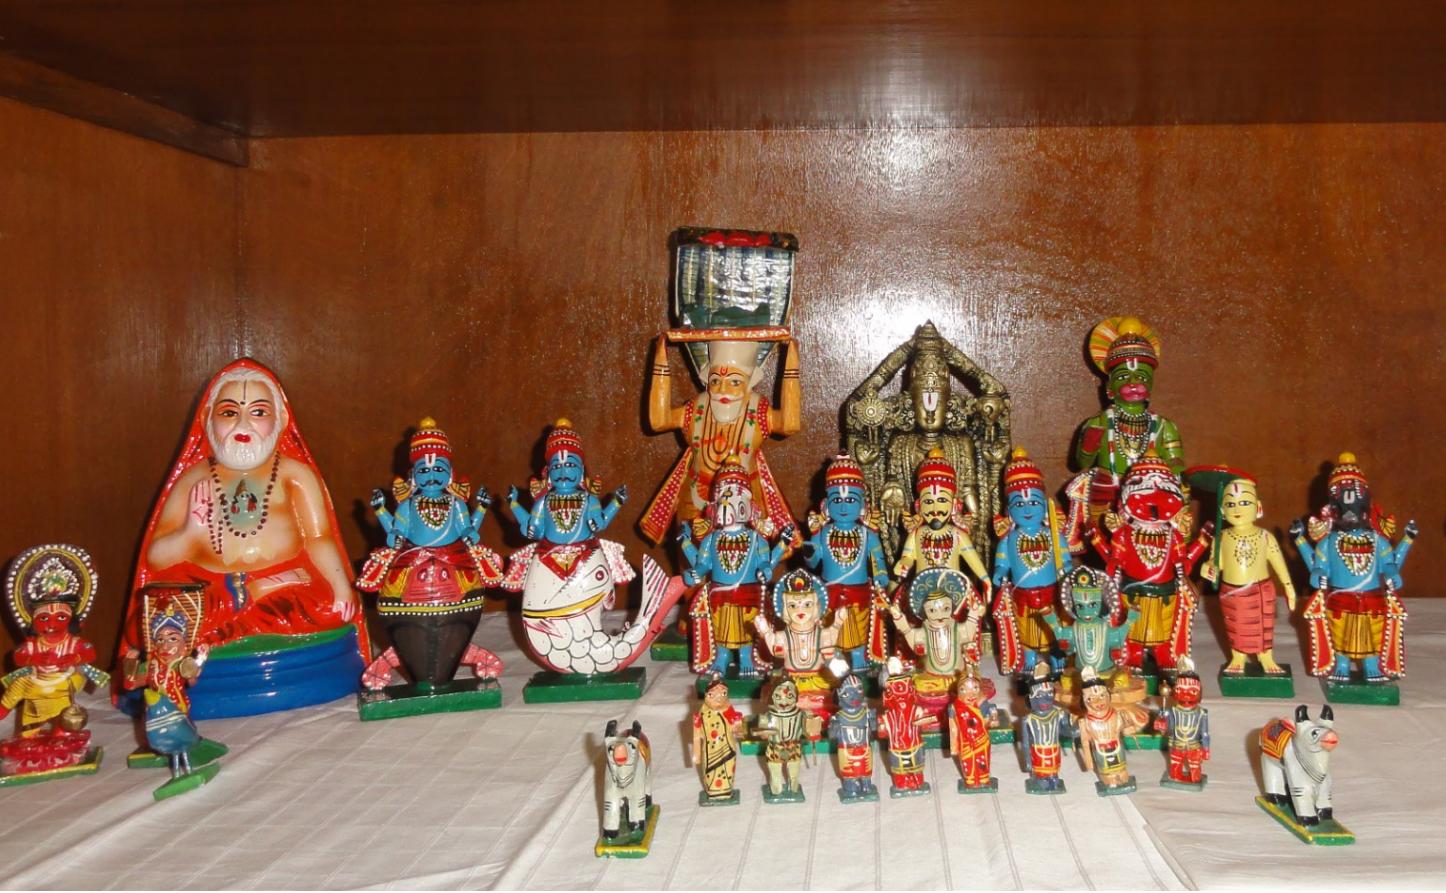 A toy story: wooden toys of Channapatna, Karnataka